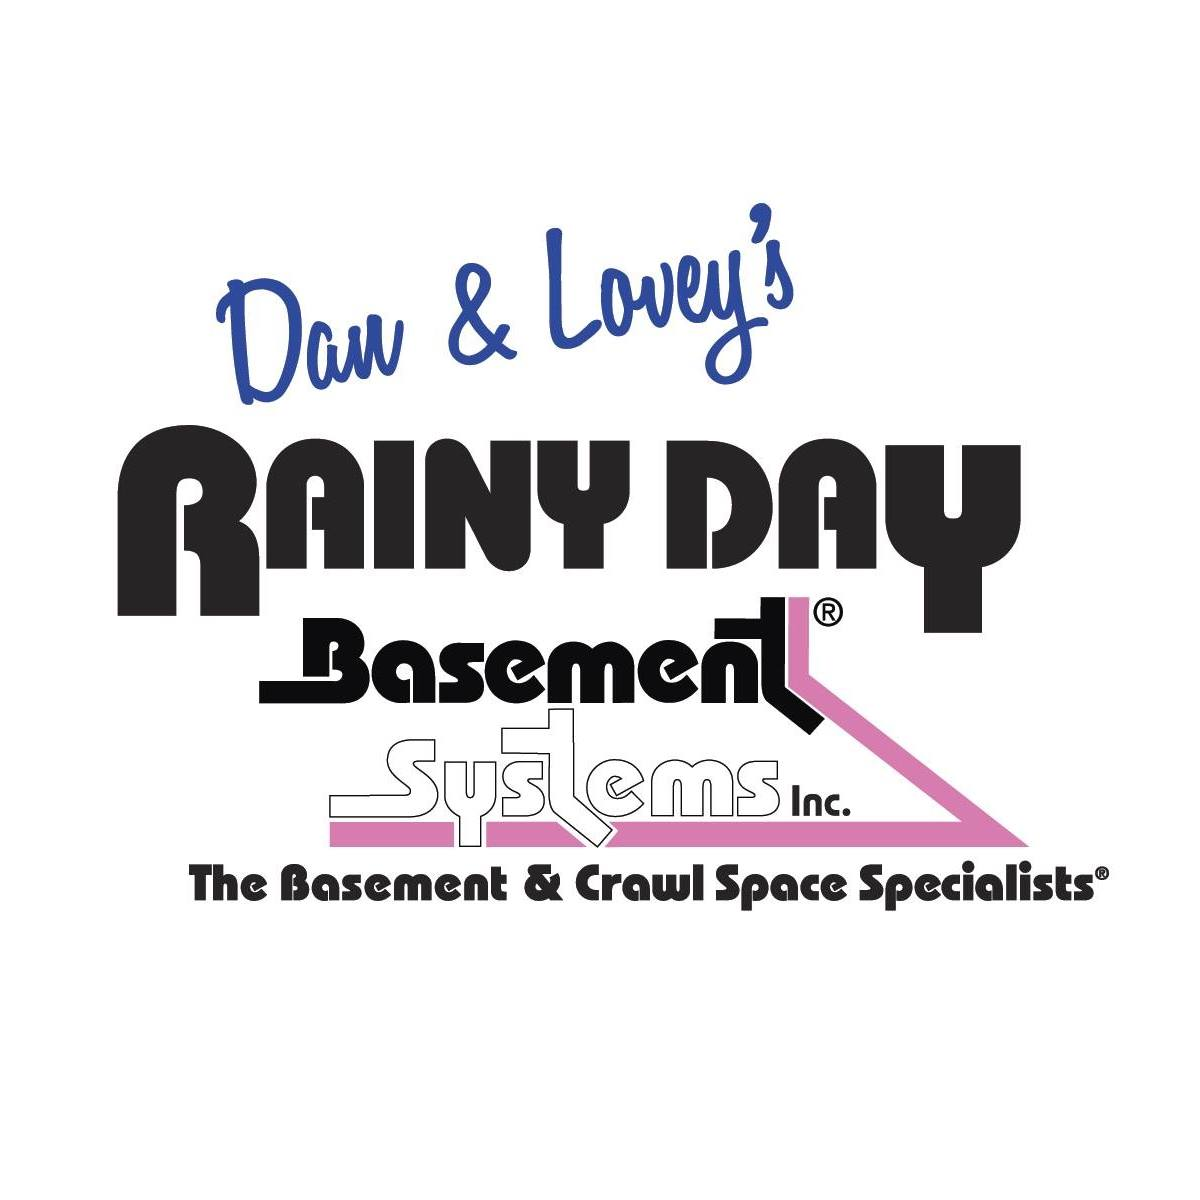 Rainy Day Basement Systems